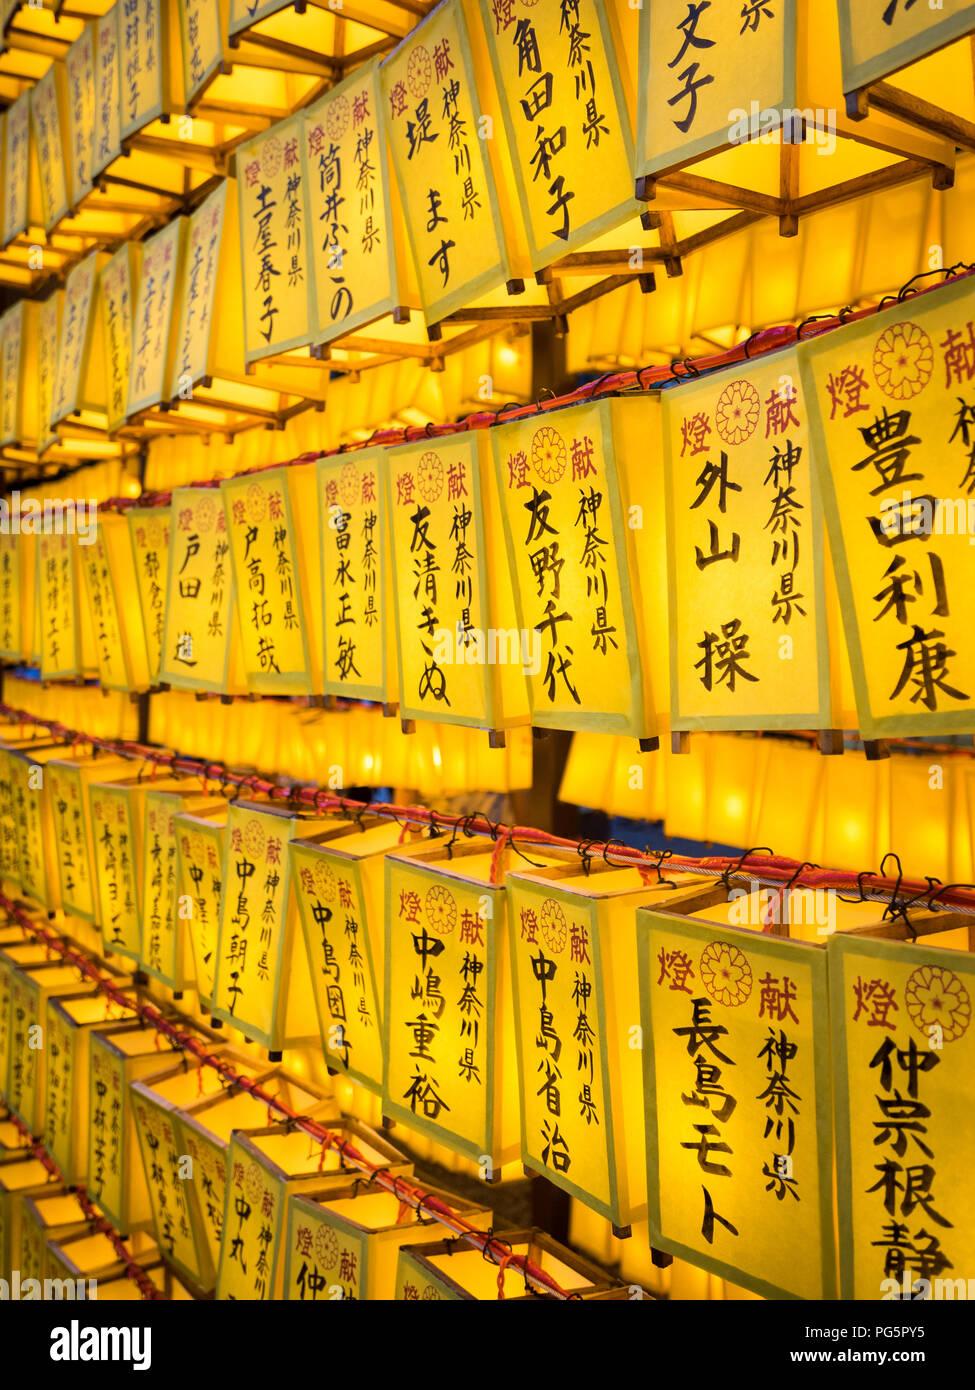 Lanterns of the 2018 Mitama Matsuri (Mitama Festival), a famous Japanese Obon (Bon) summer festival. Yasukuni Shrine, Ichigaya, Tokyo, Japan. Stock Photo